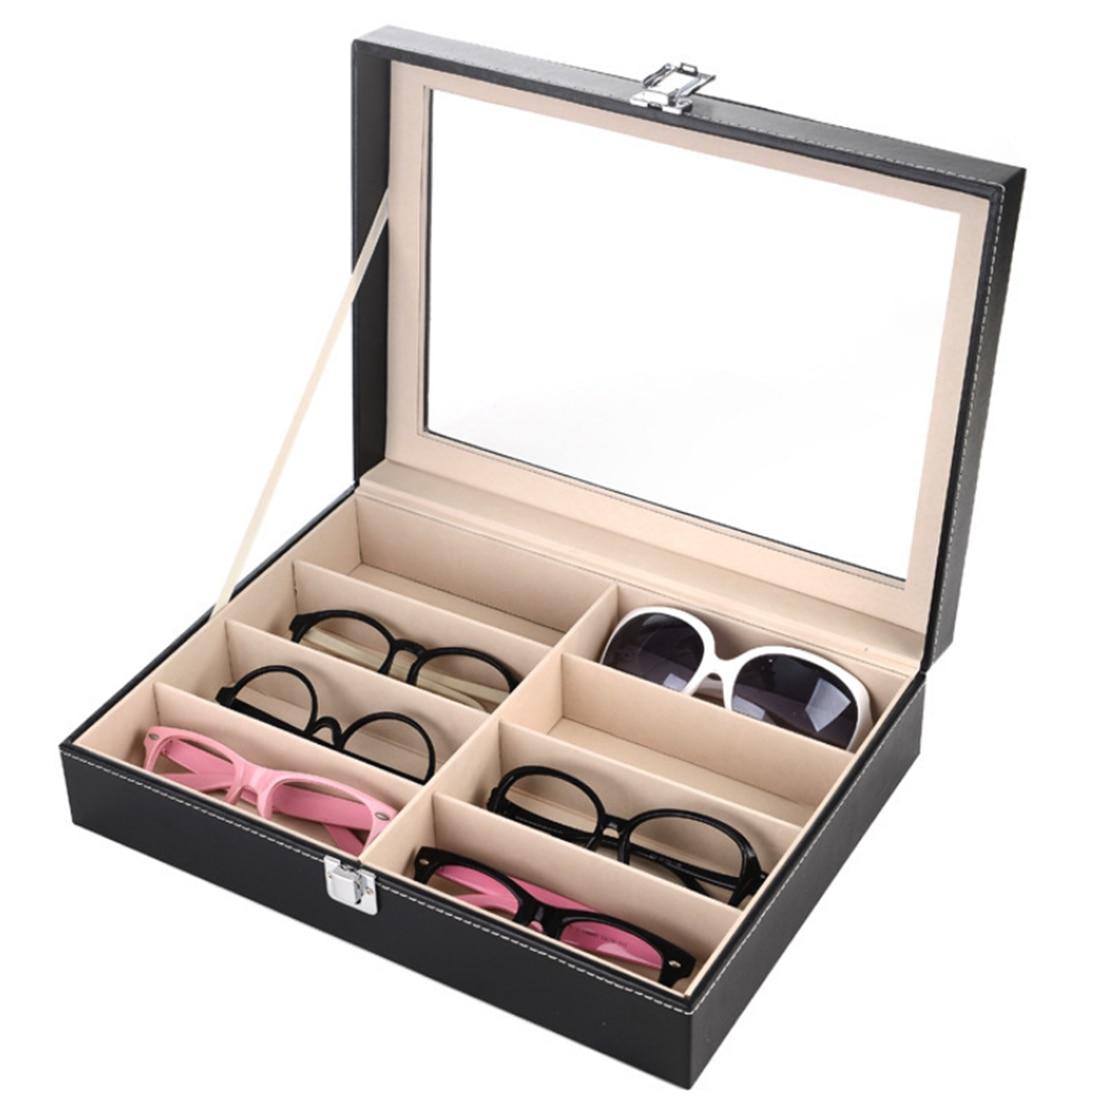 8 Grids PU Leather Glasses Storage Box Sunglasses Show Box Eyeglasses Organizer Collector Household Shop Supplies Organizer Box